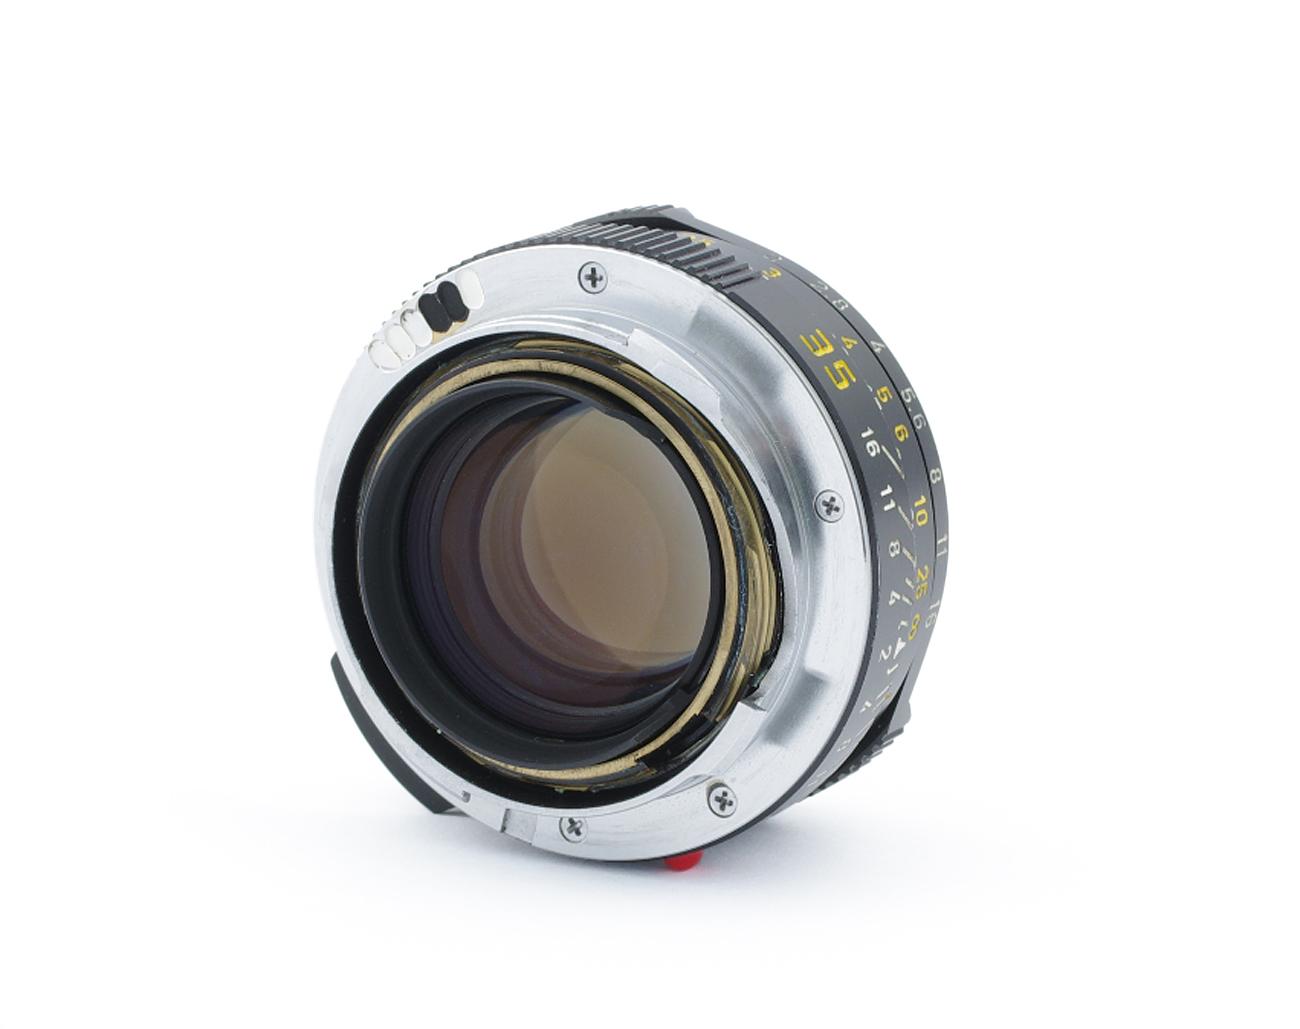 Leica-M-Summicron-2-35-mm-3061350-Canada-Lens-6-bit Indexbild 3